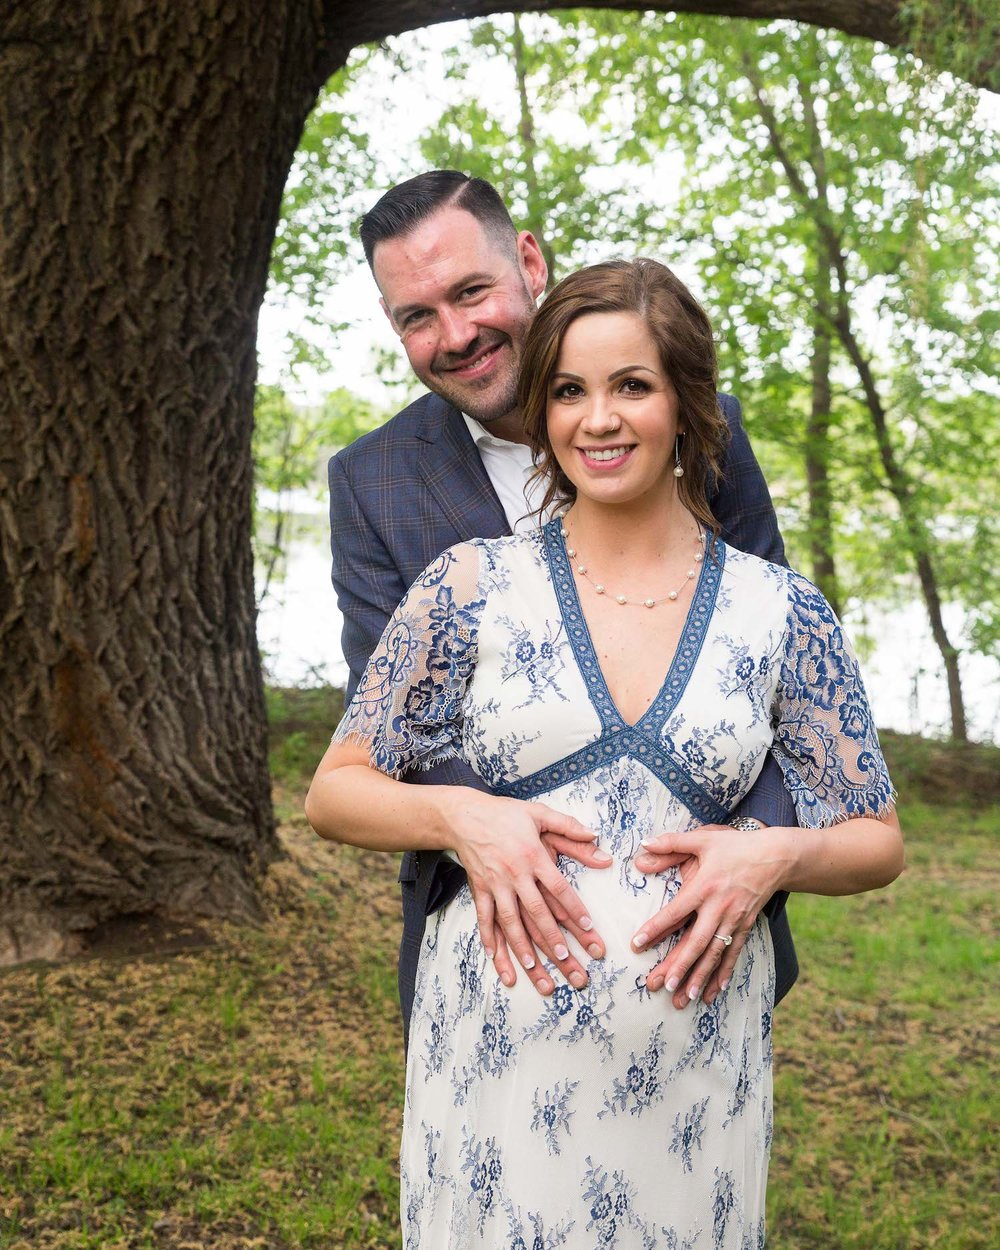 Cindyrella's Garden, pregnant bride in blue and white lace wedding dress, shotgun wedding